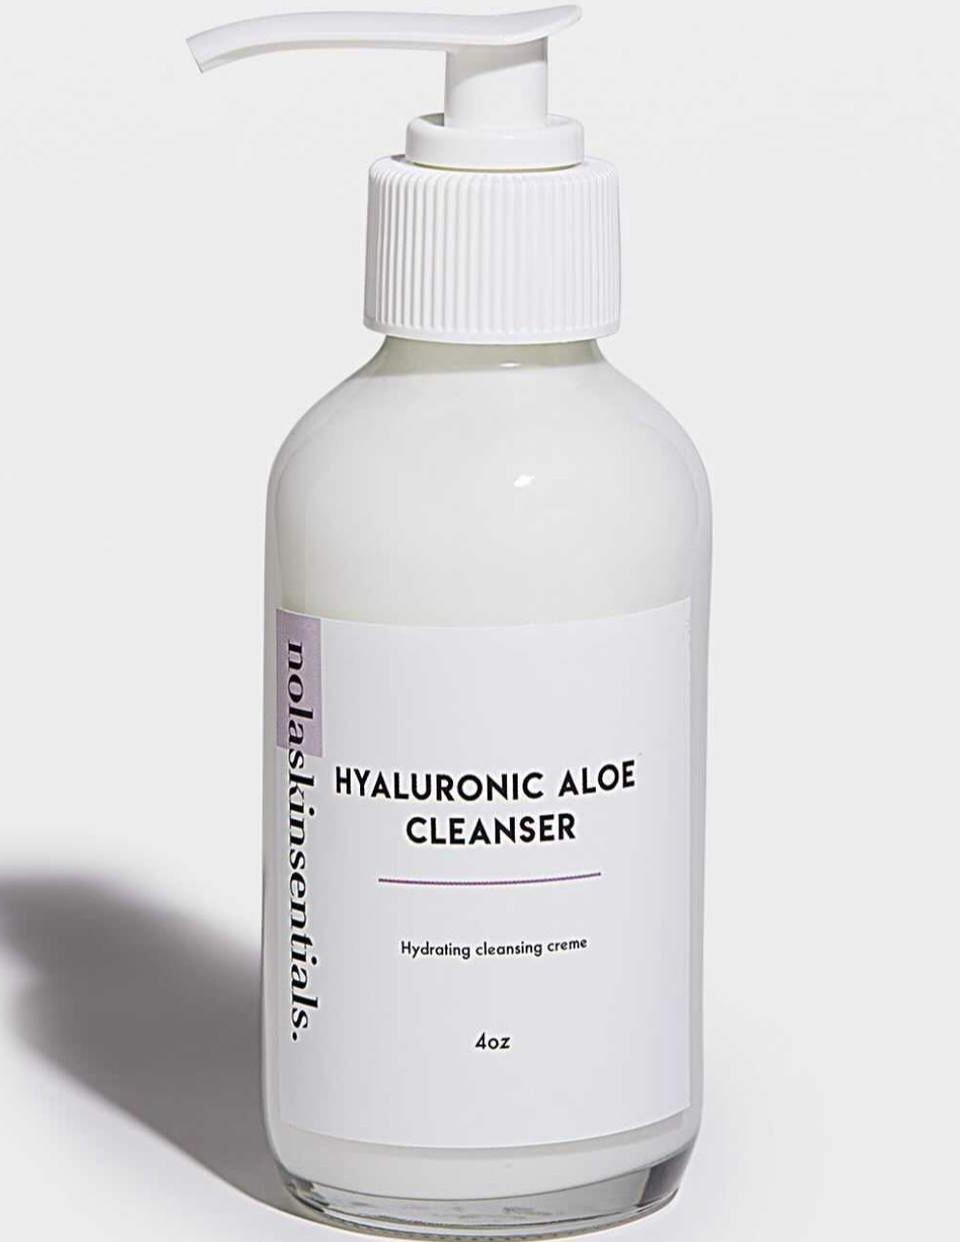 Nolaskinsentials Hyaloronic Aloe Cleanser